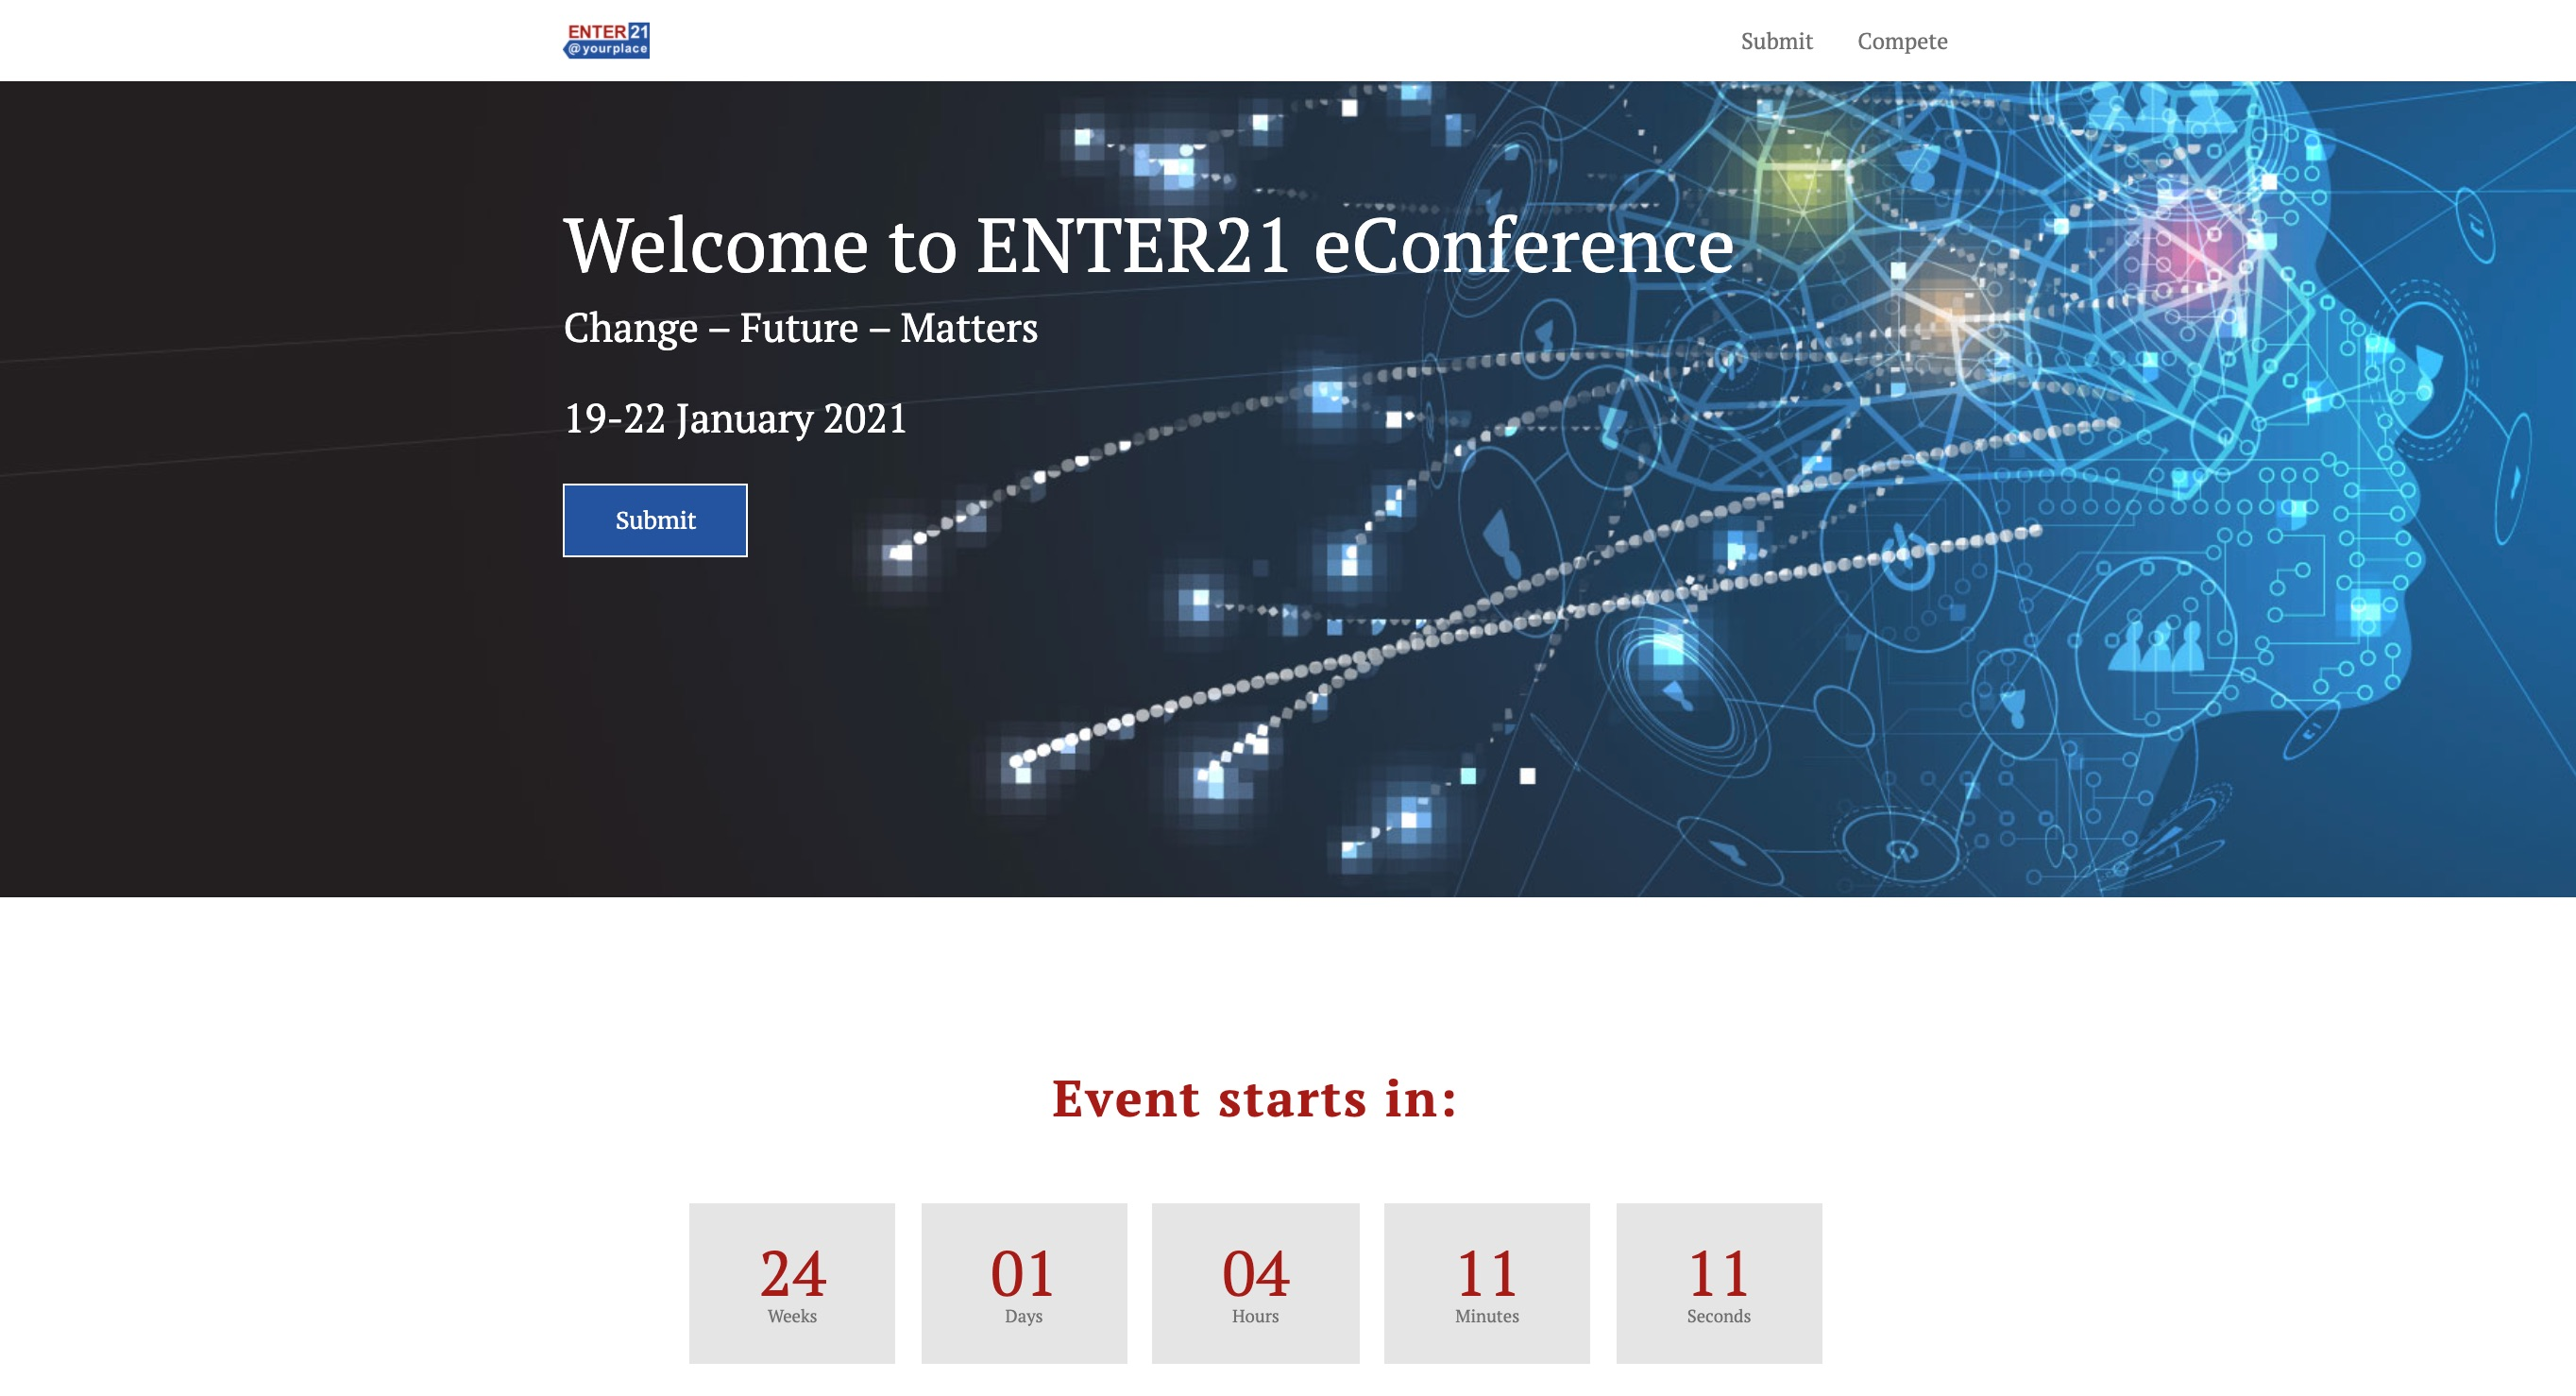 Neuer Kunde: Enter21 Conference